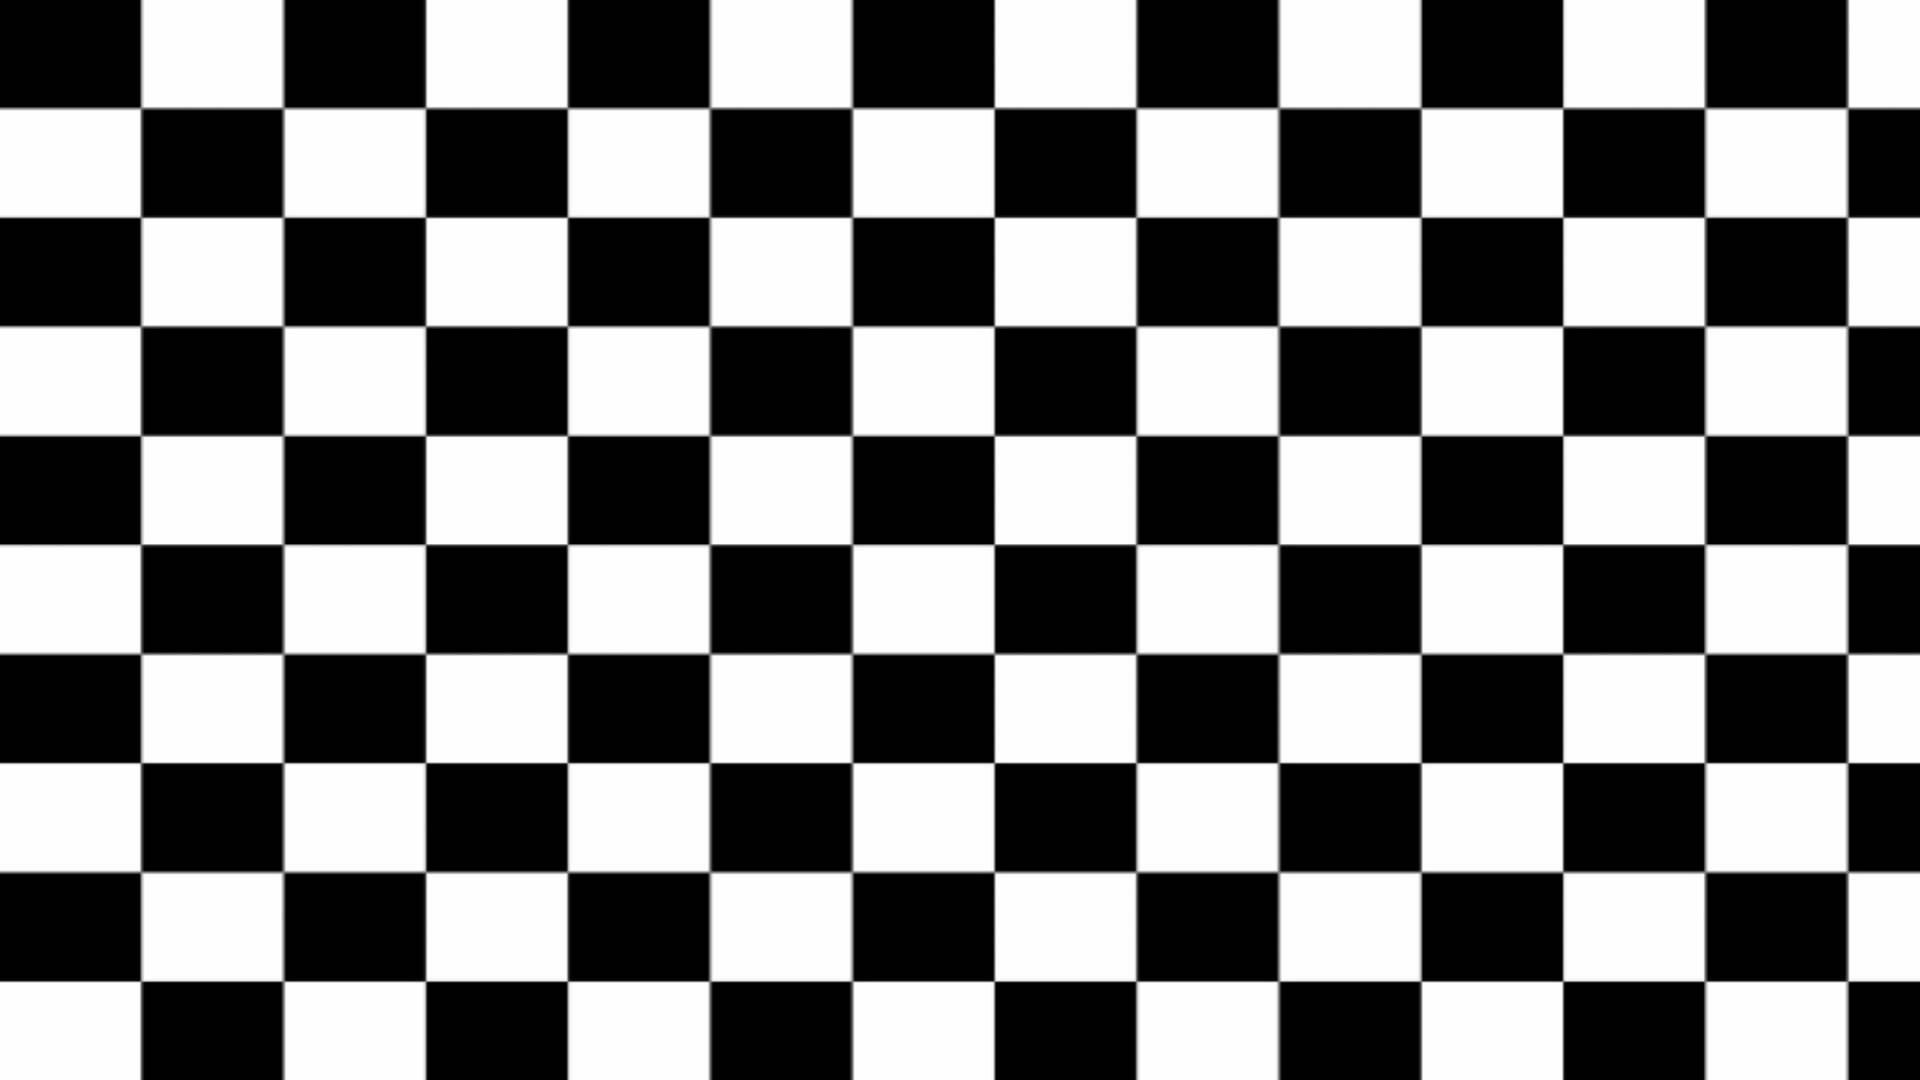 Checker board clipart vector freeuse Free Checkerboard, Download Free Clip Art, Free Clip Art on Clipart ... vector freeuse